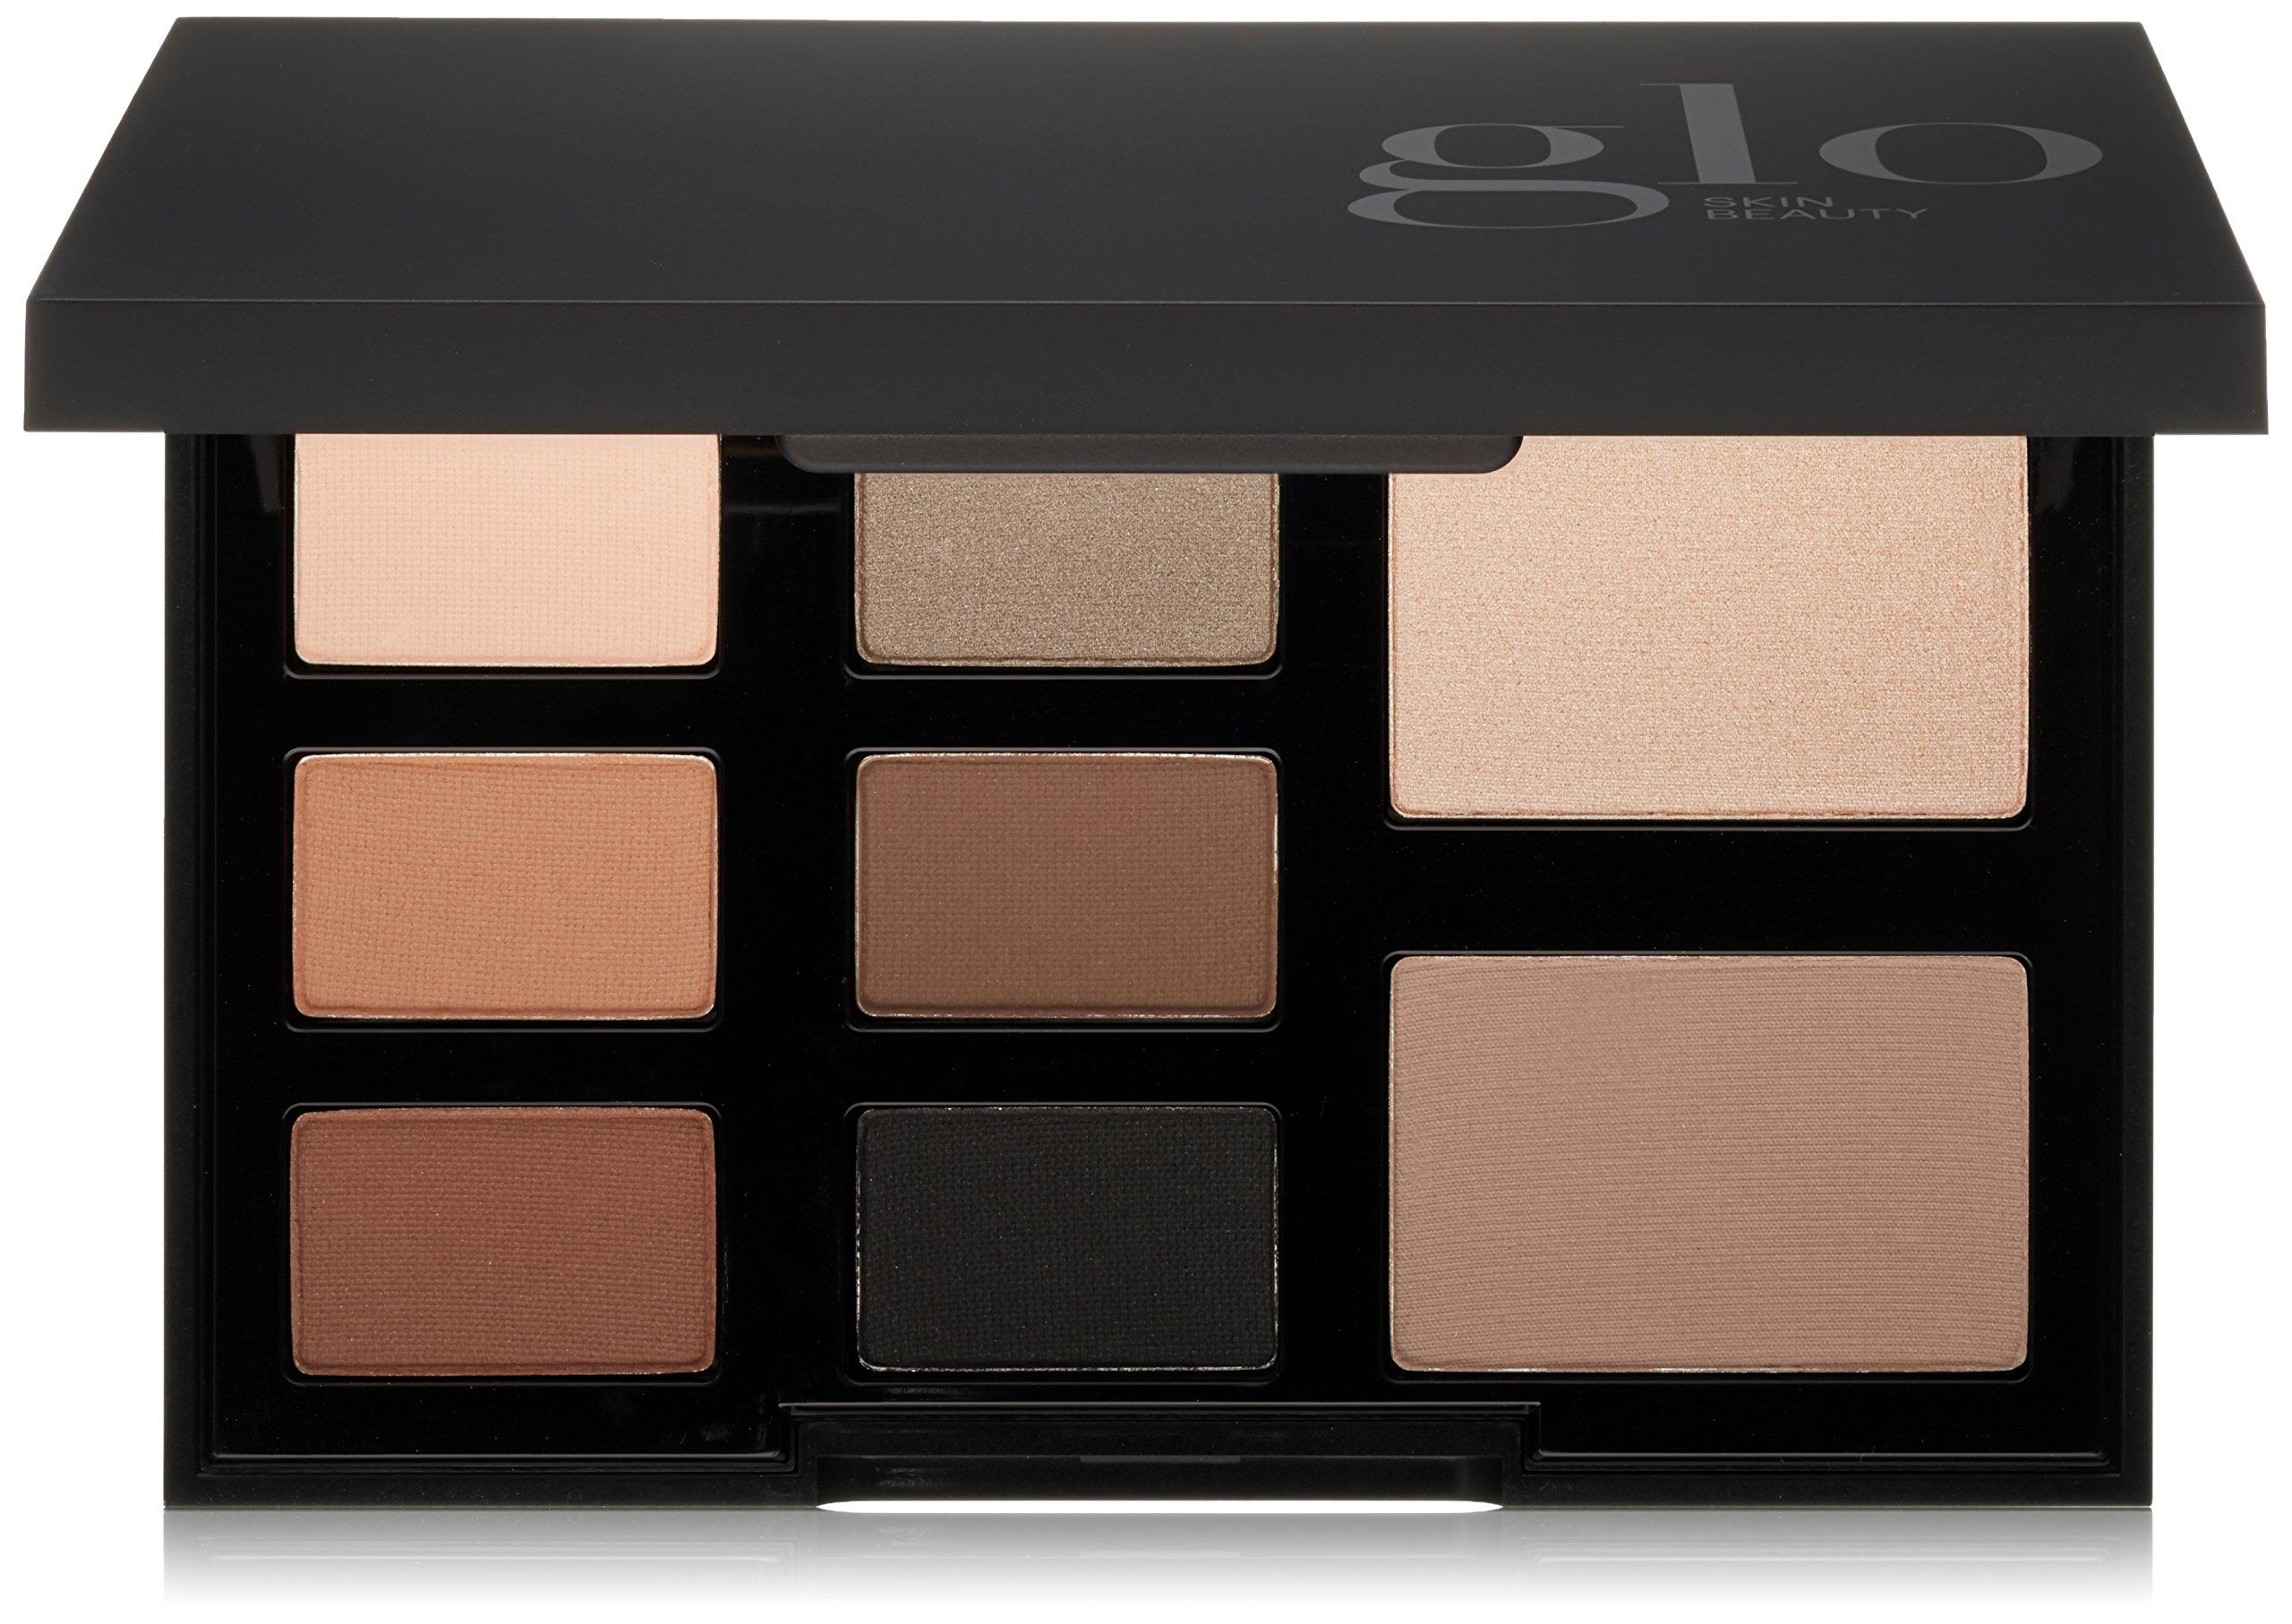 Glo Skin Beauty Shadow Palette - Elemental Eye - 8-Color Mineral Makeup Eyeshadow Palette, 4 Shade Options | Cruelty Free